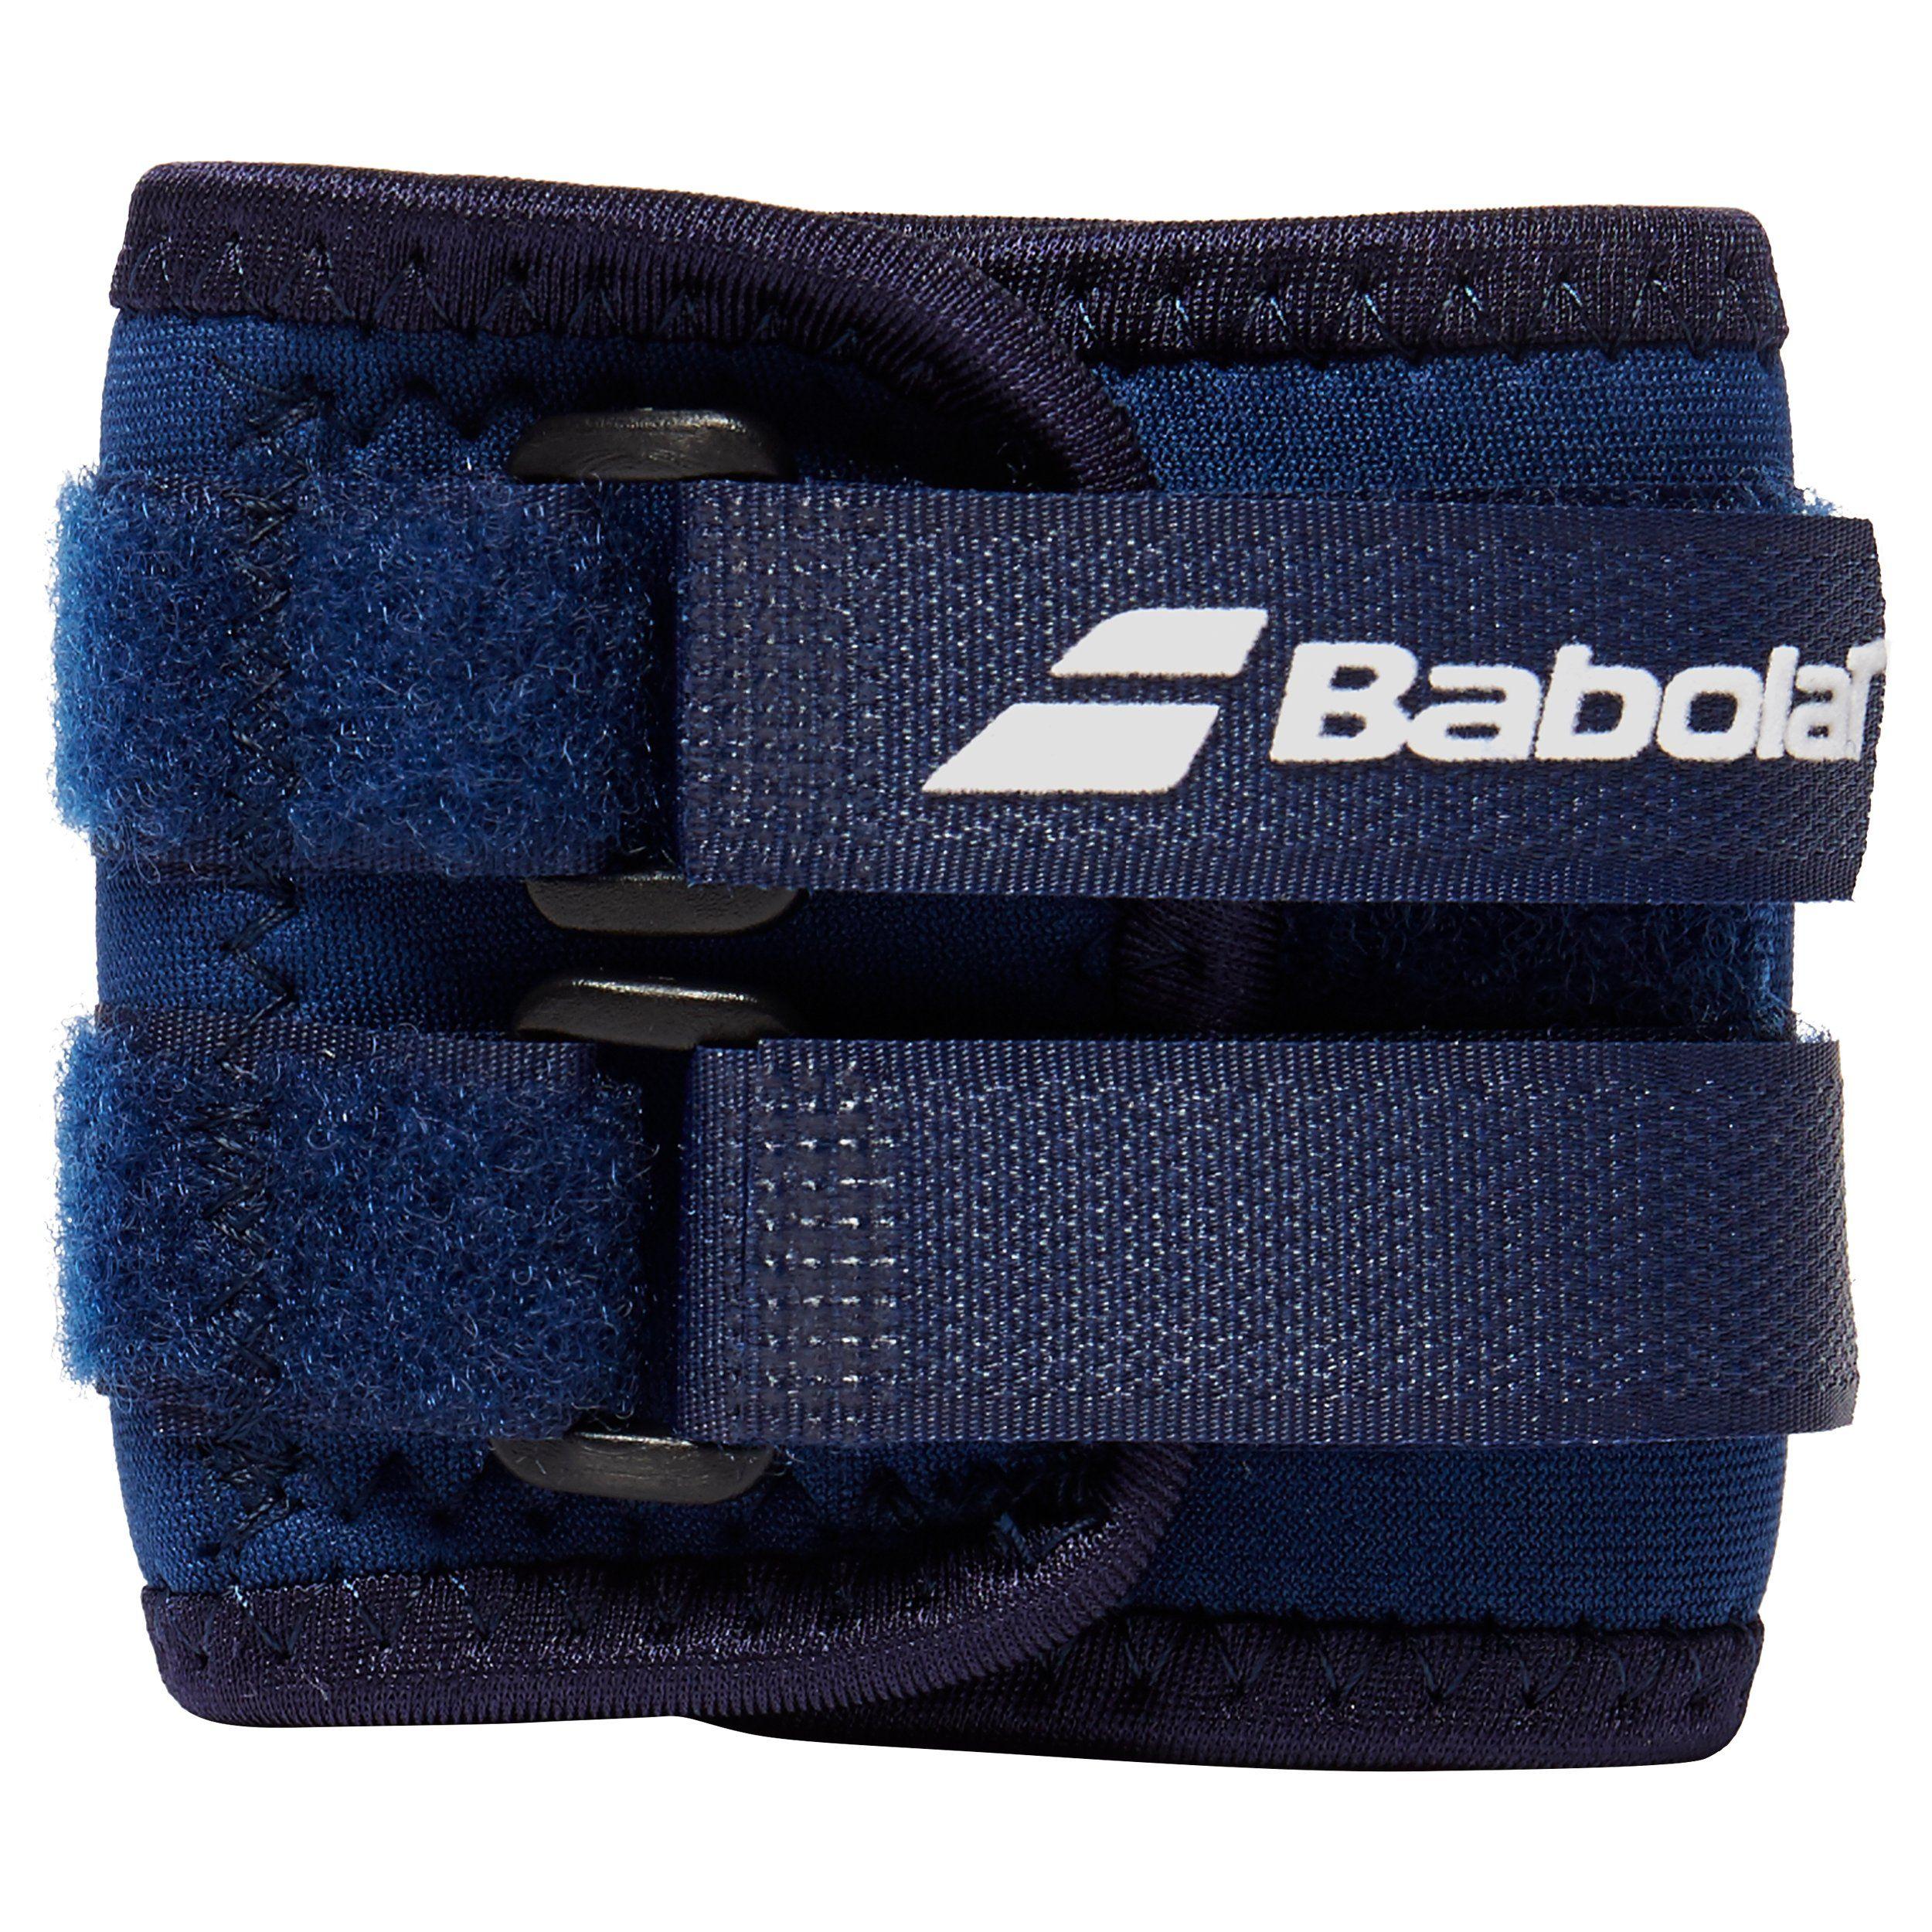 Babolat Wrist support